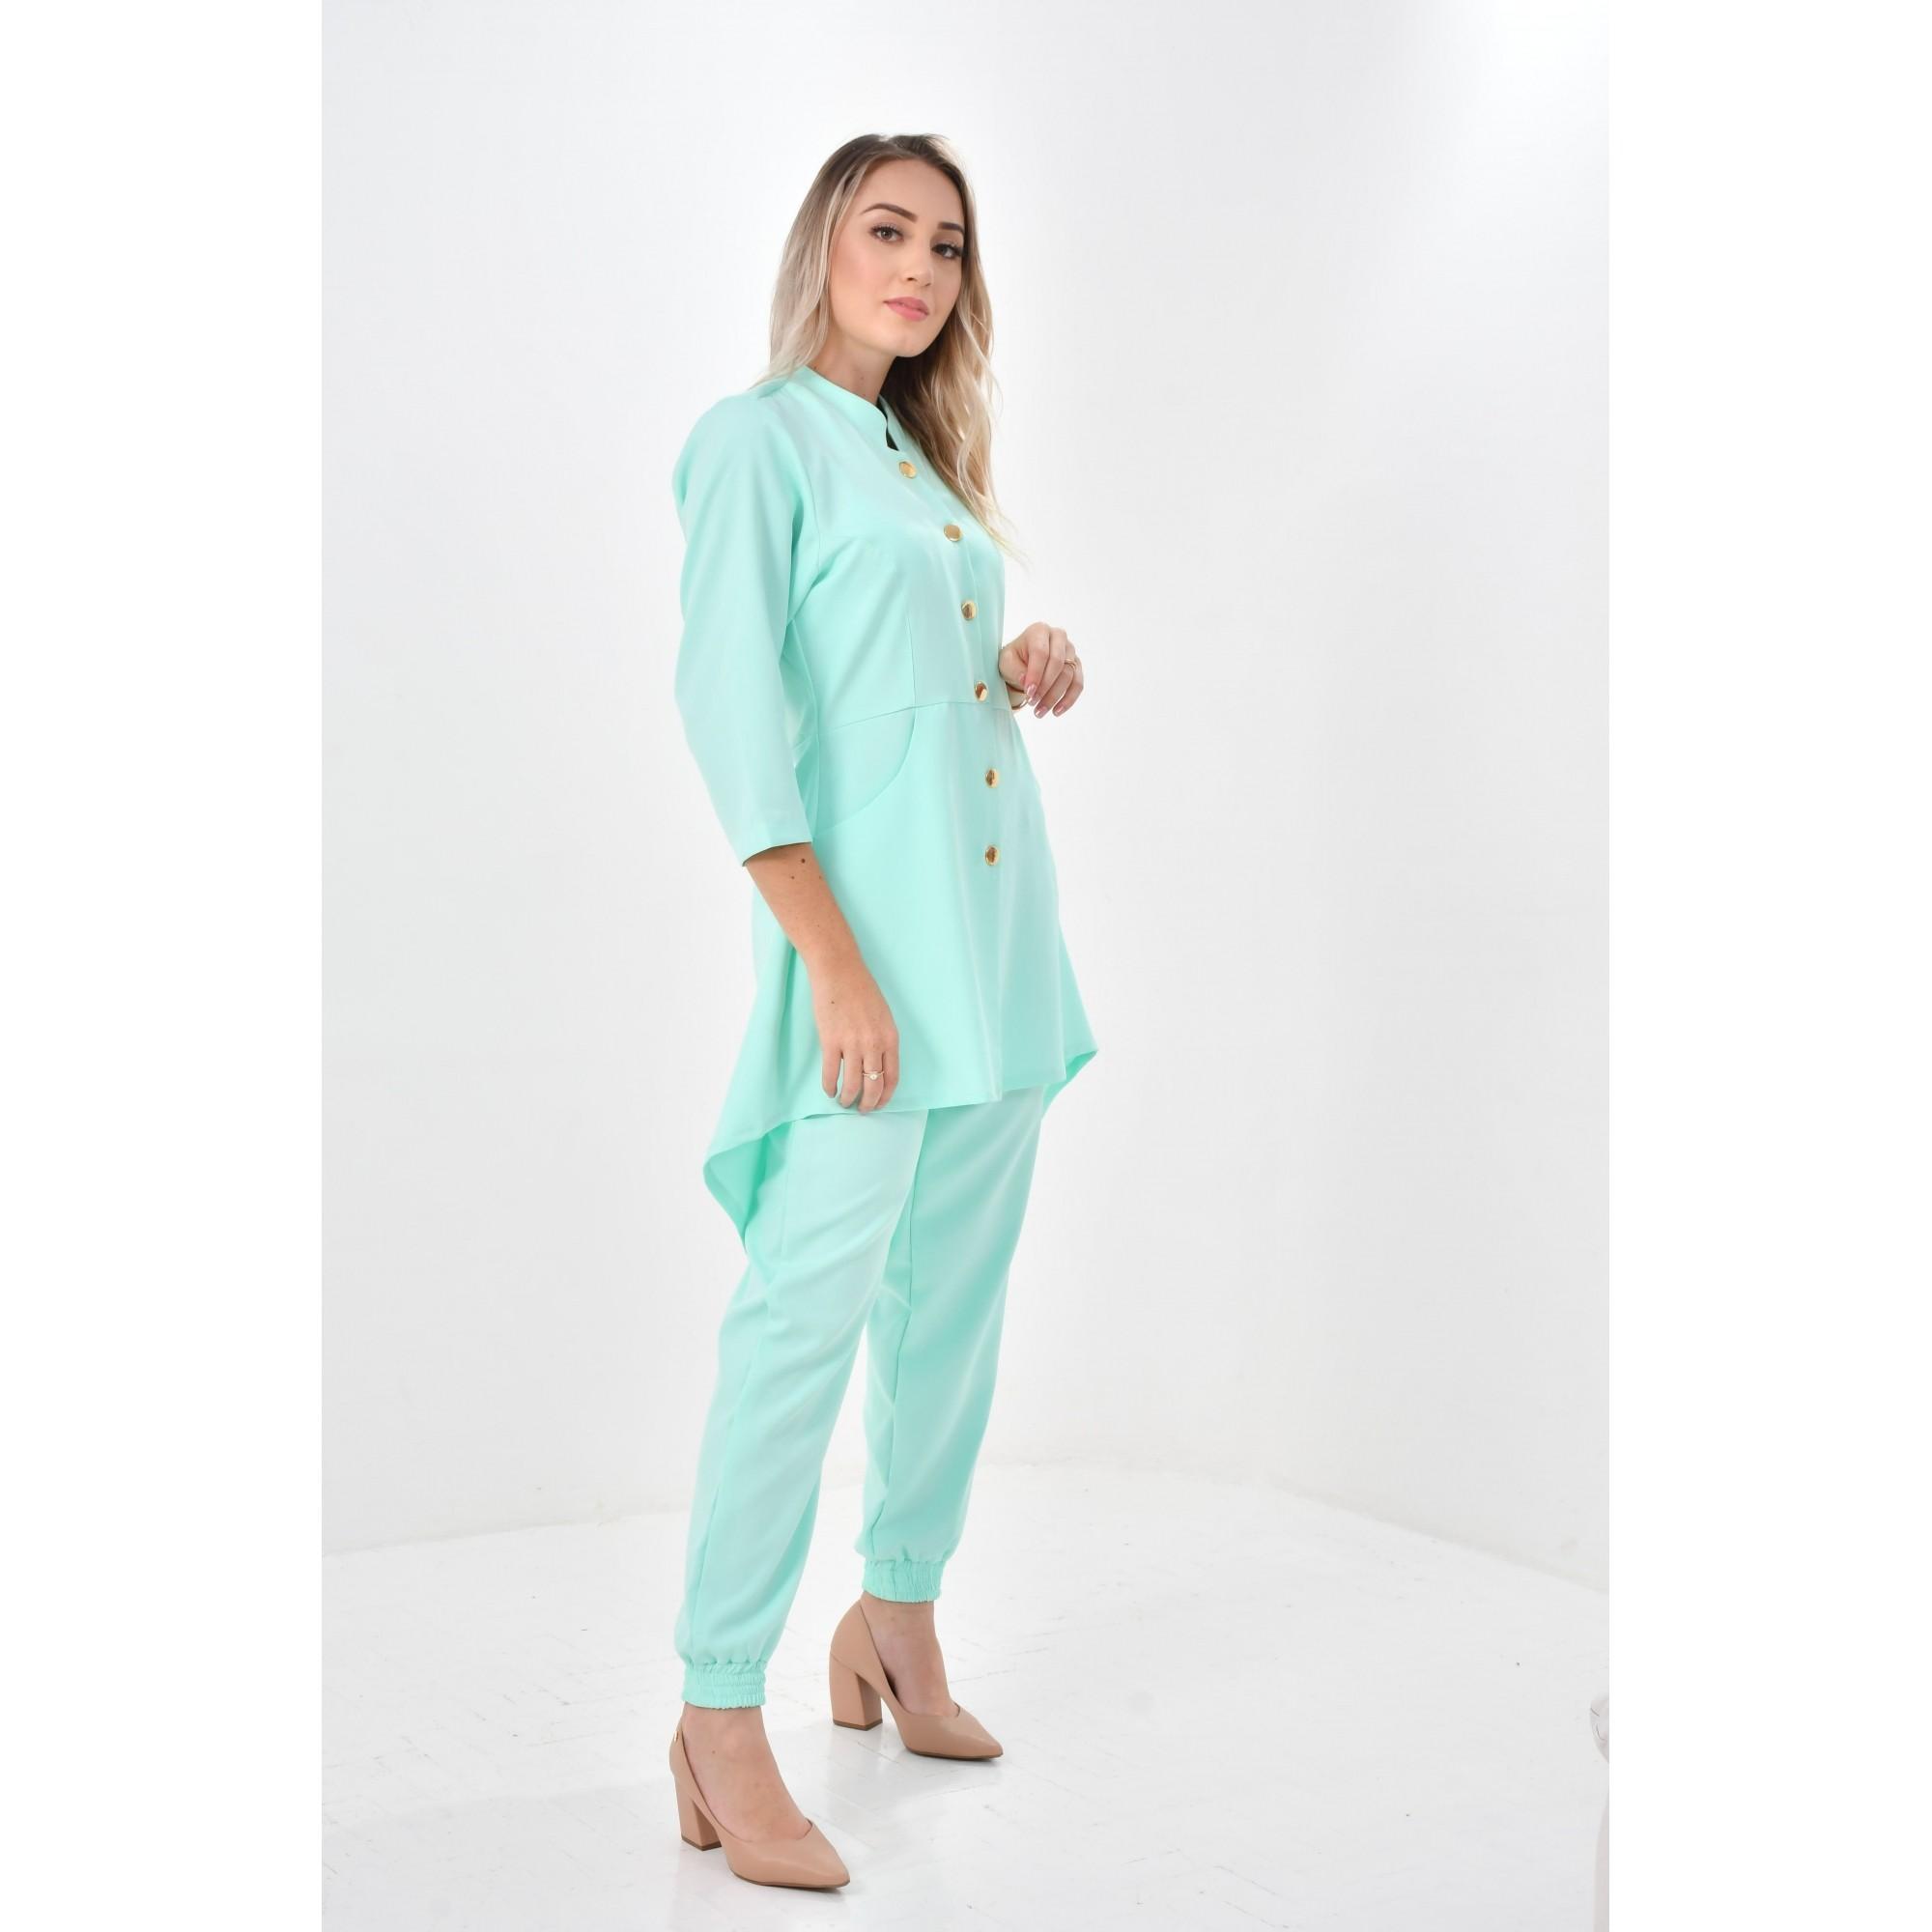 Jaleco Beatriz  - Luxo Branco - Jalecos Personalizado Feminino